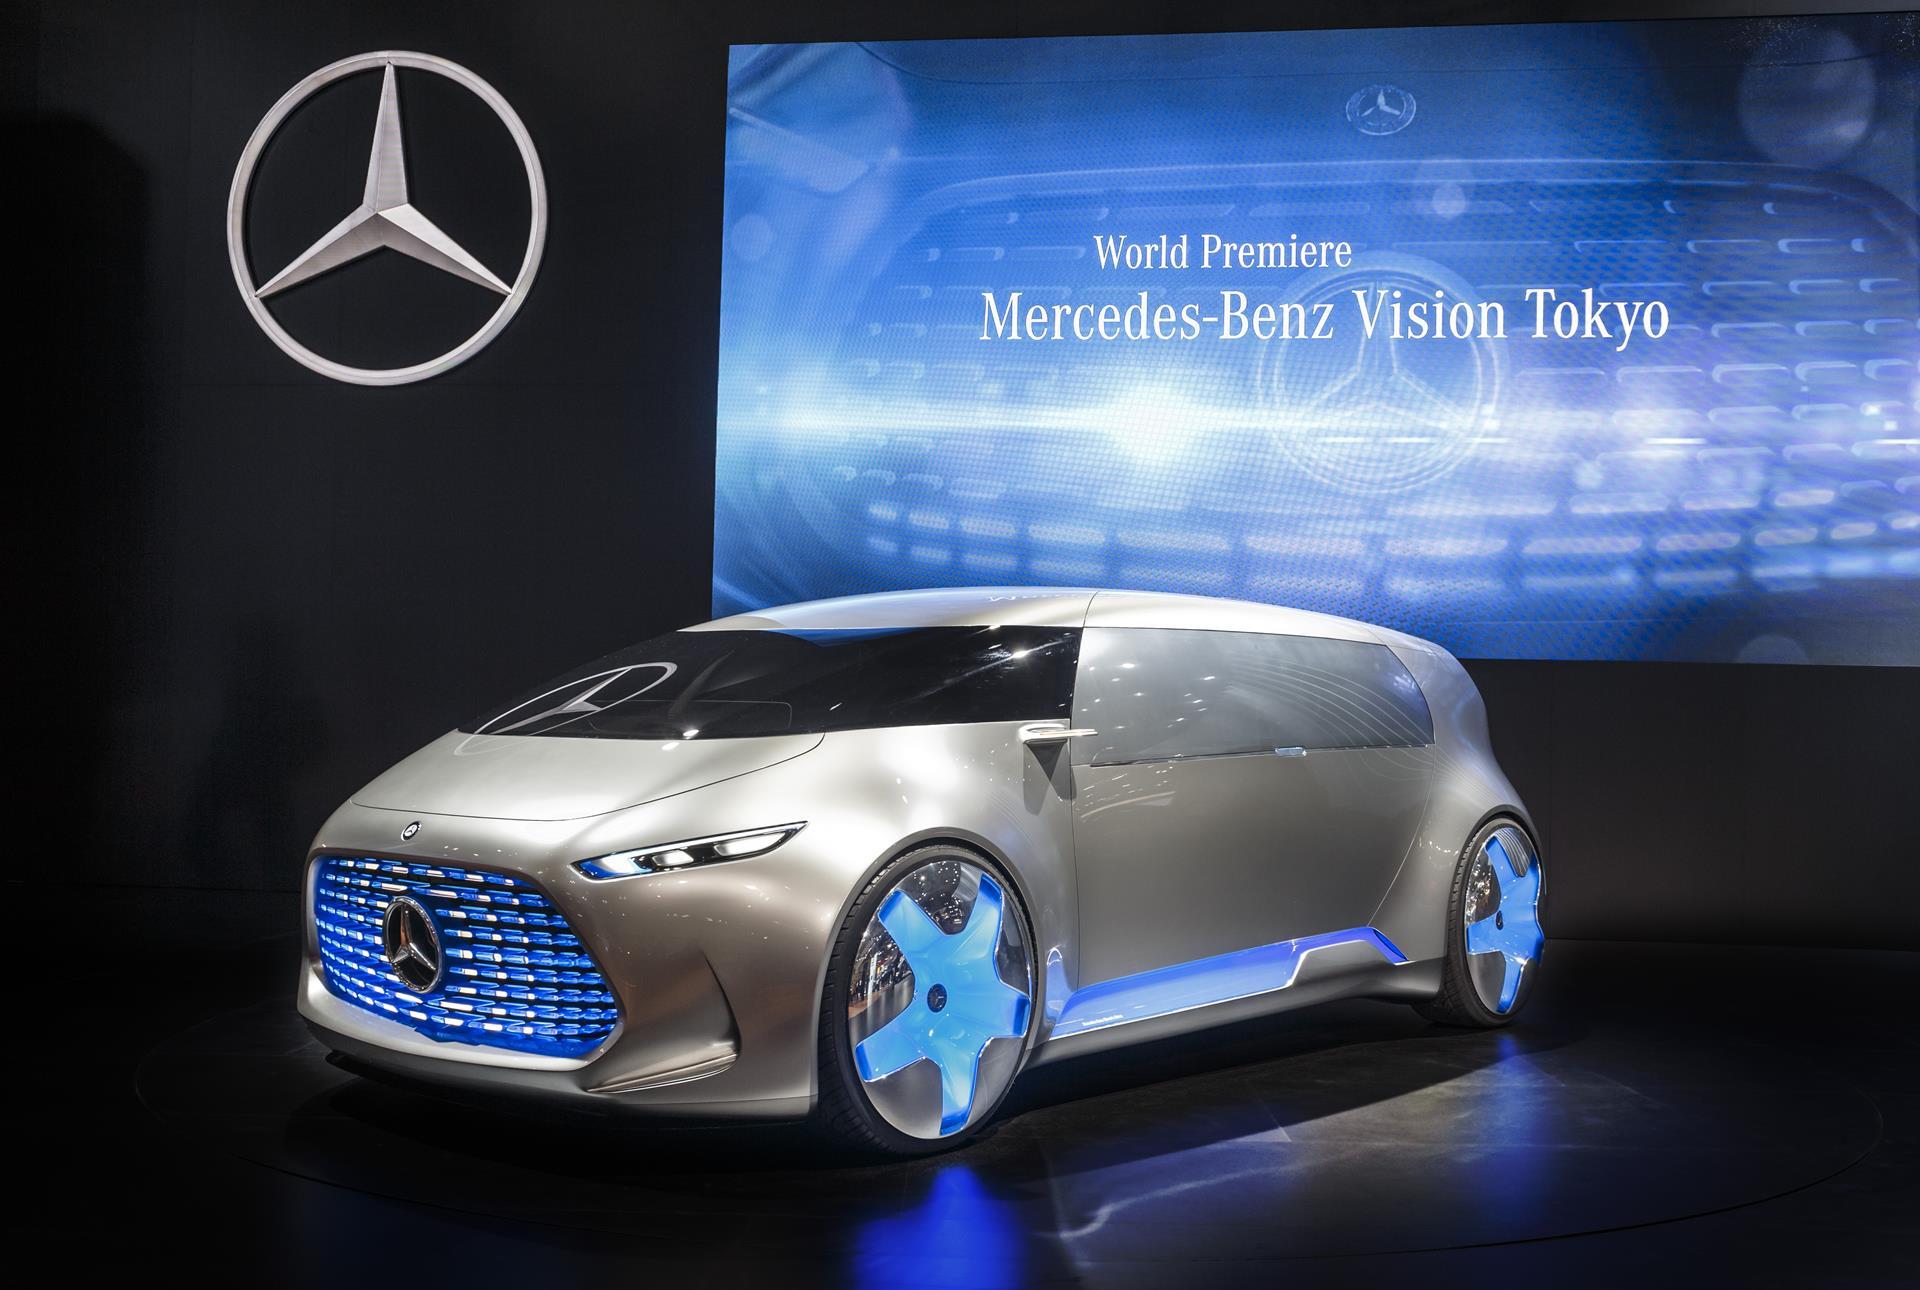 https://www.conceptcarz.com/images/Mercedes-Benz/2015-Mercedes-Vision-Tokyo-Concept-01.jpg